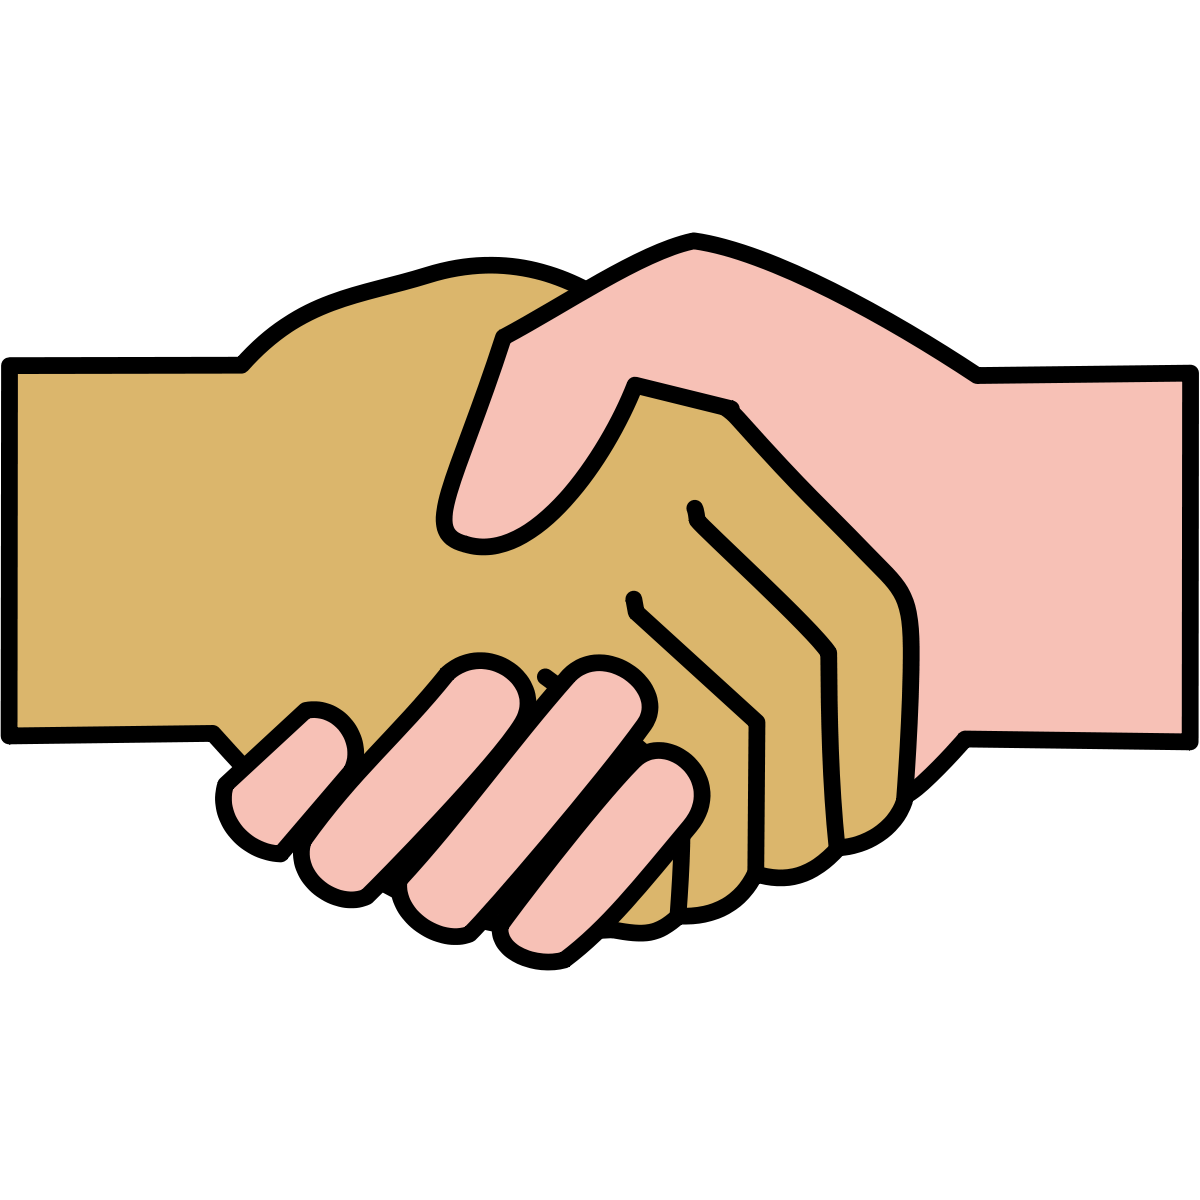 . Handshake clipart alliance